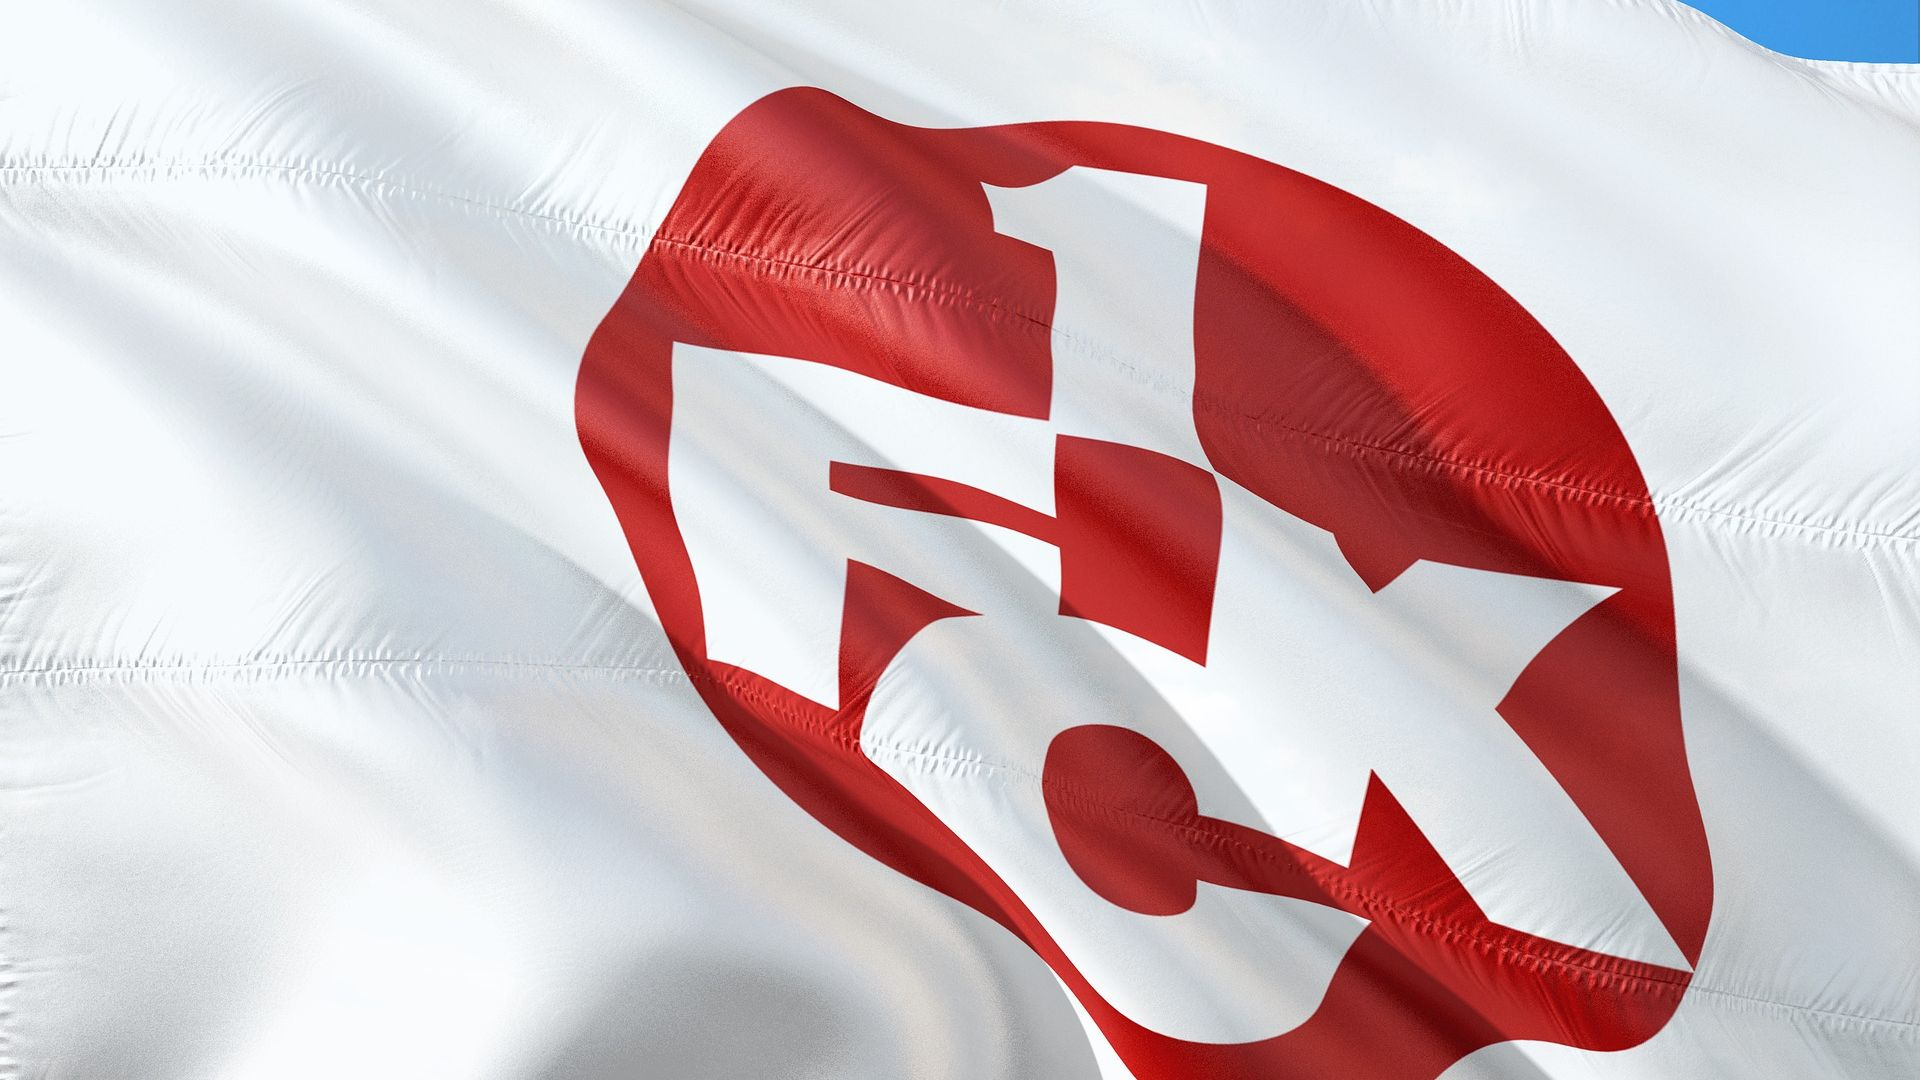 Fanversammlung des FCK morgen-Image